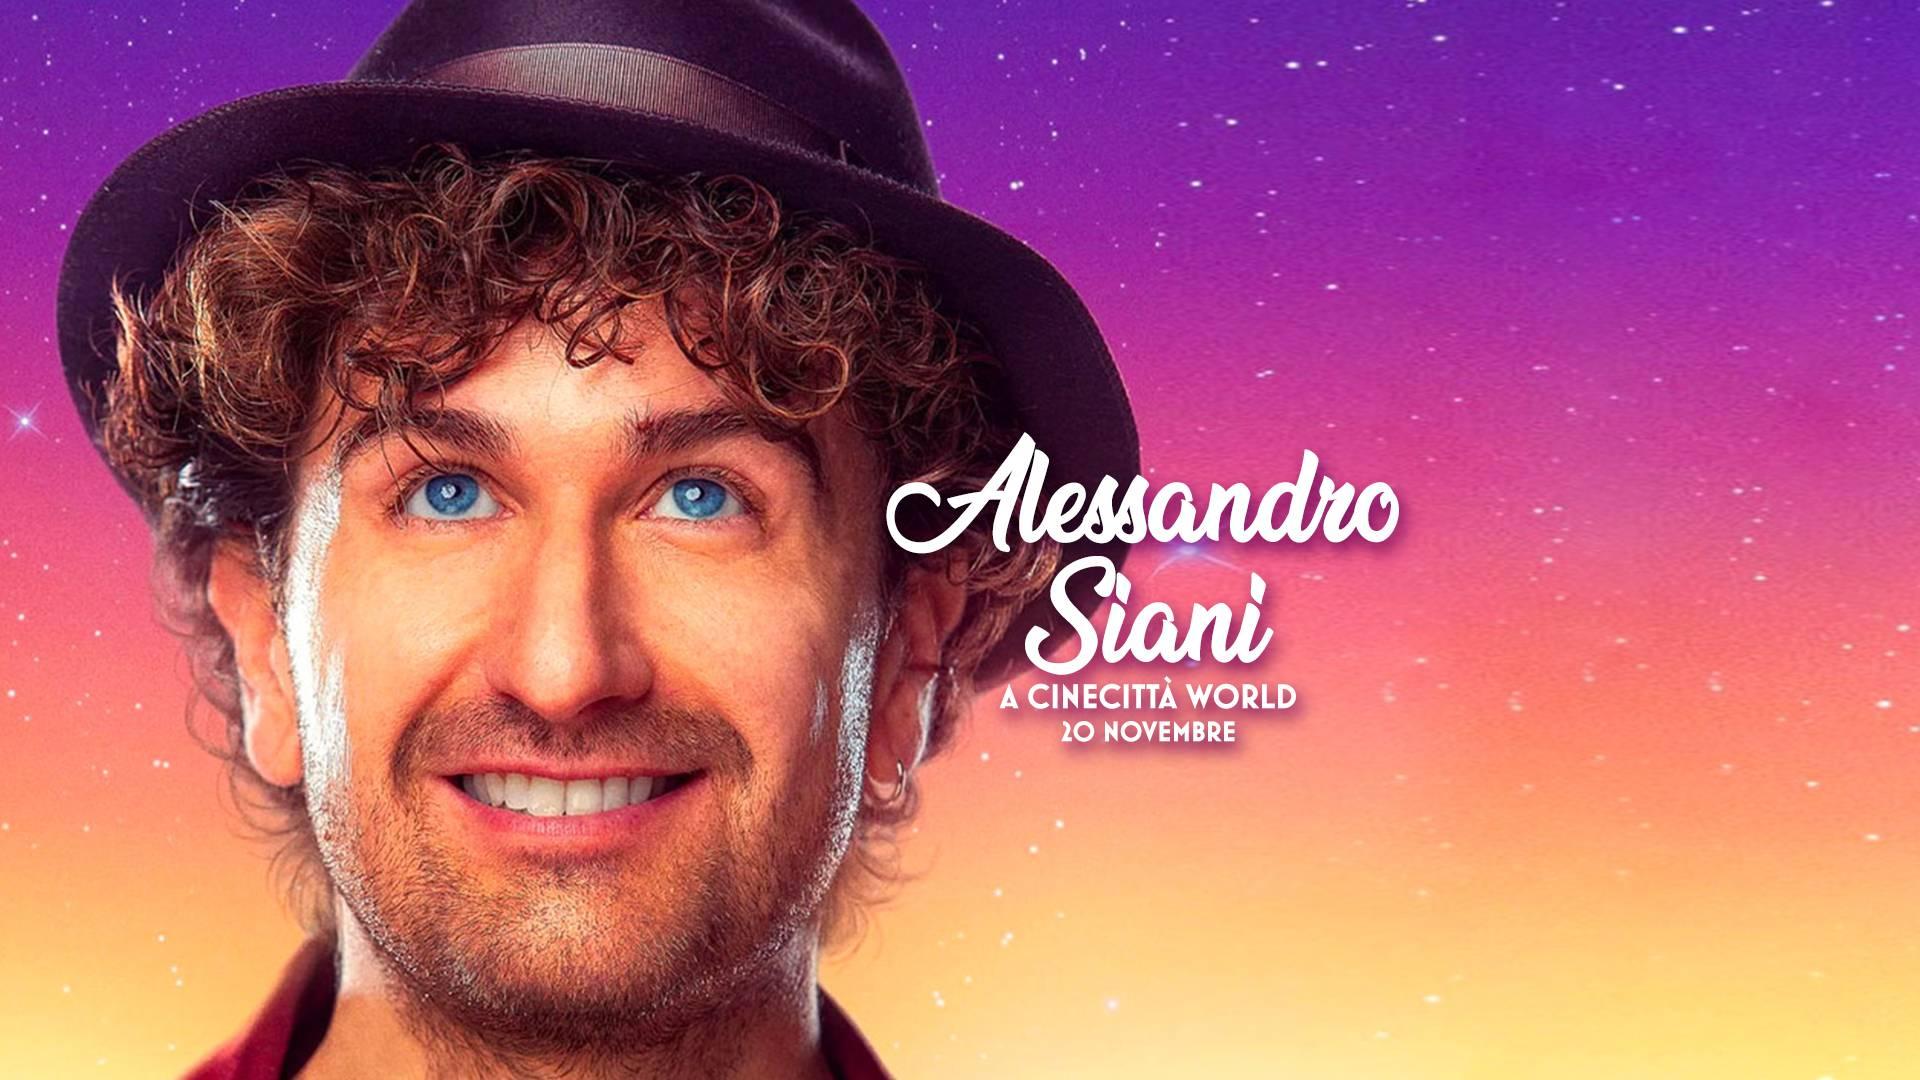 A CINECITTA' WORLD E' ALESSANDRO SIANI SHOW - Target Magazine Online